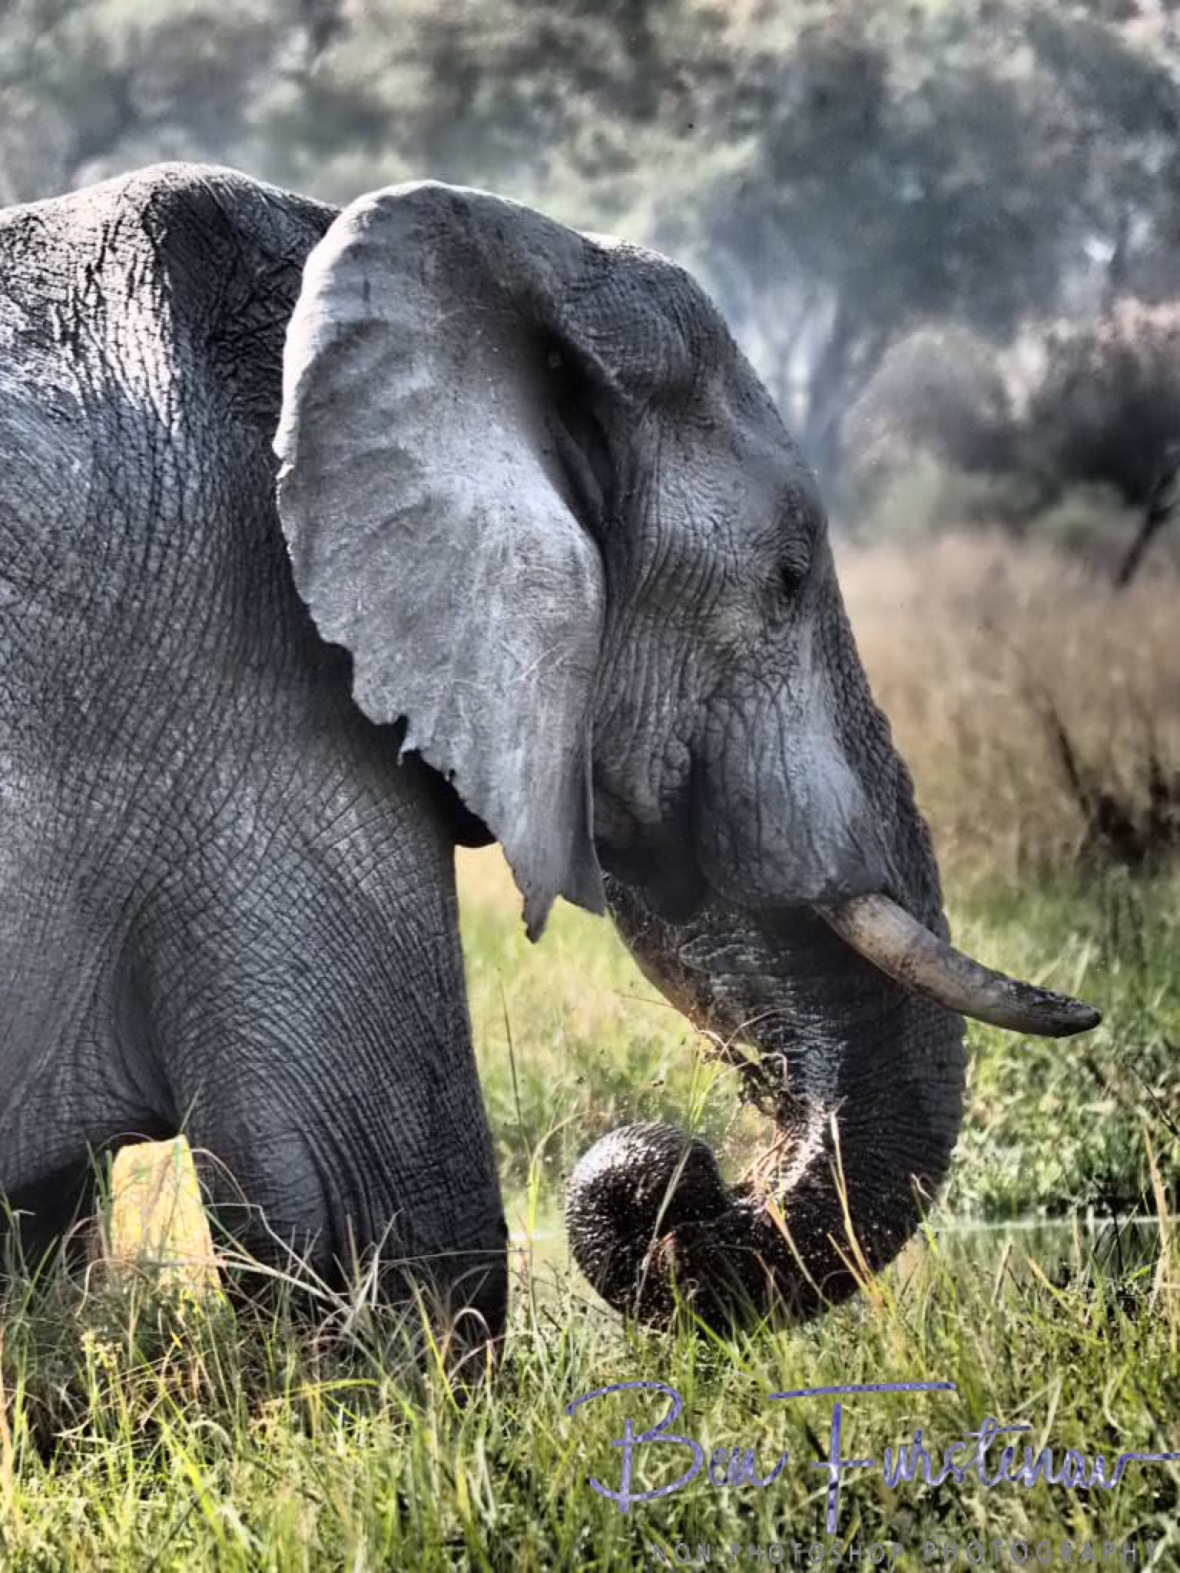 Impressive trunk size, Moremi National Park, Botswana